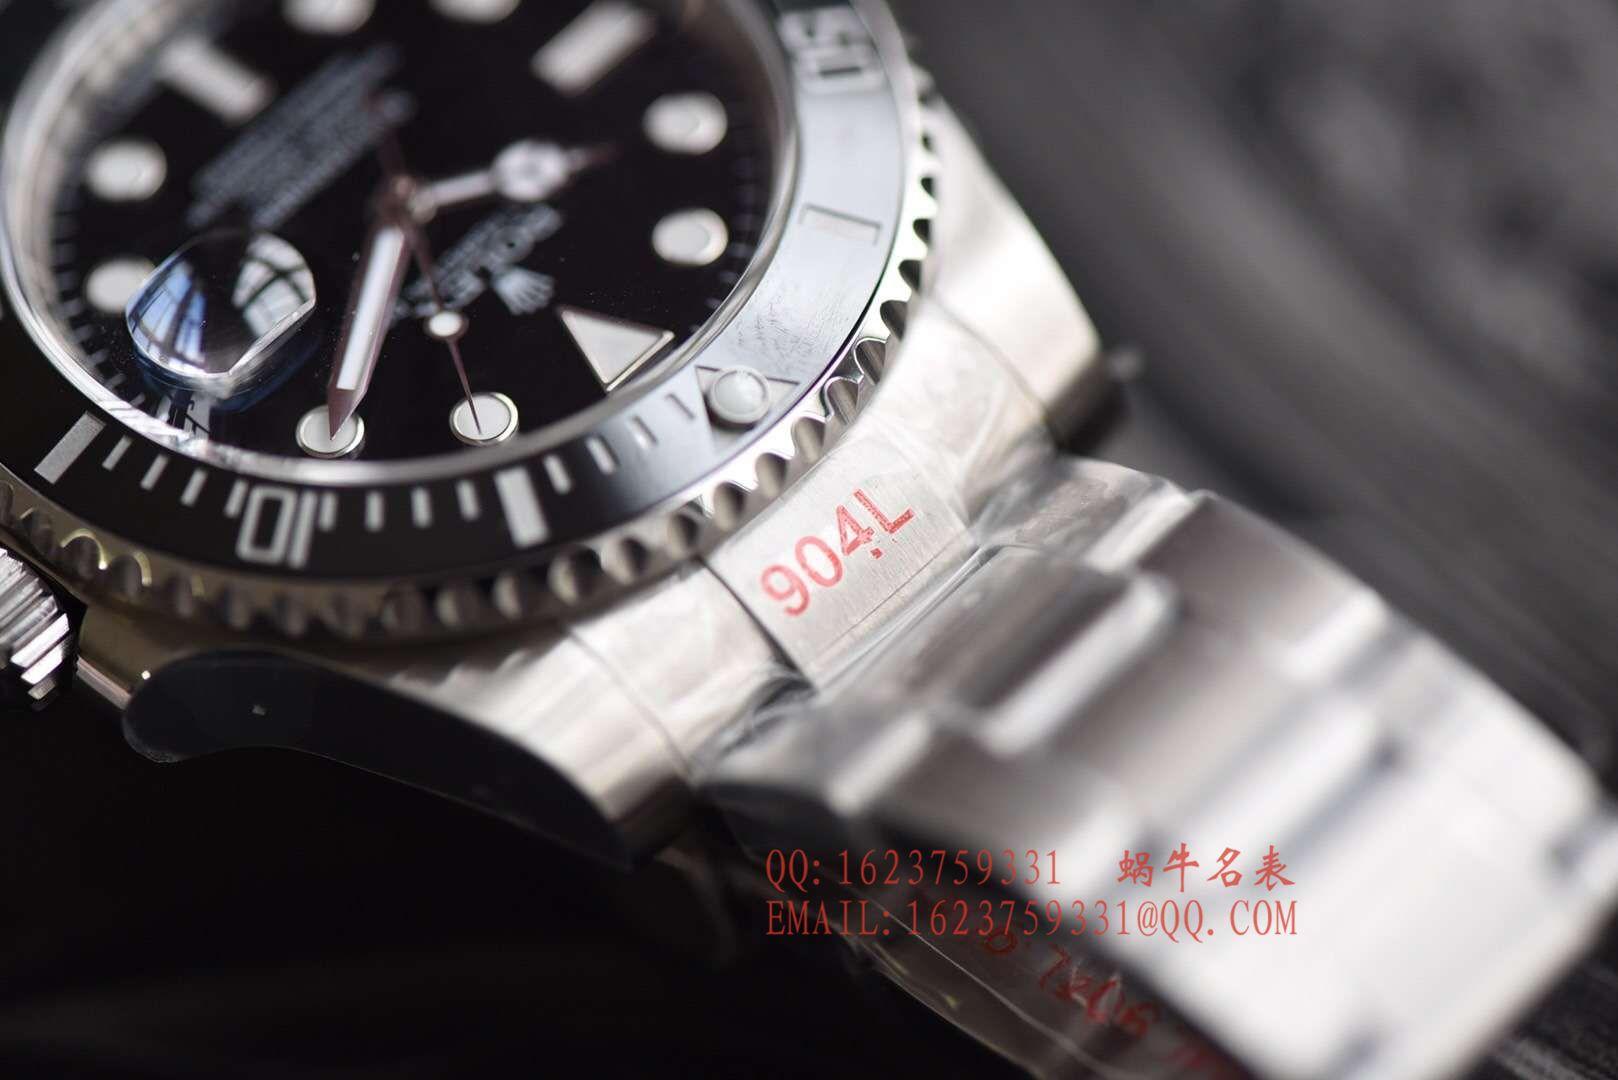 【NOOB厂V9版本904L不锈钢版本】劳力士潜航者型系列116610LV-97200 绿盘腕表(绿水鬼)、116610LN-97200 《黑水鬼》 / RCB199